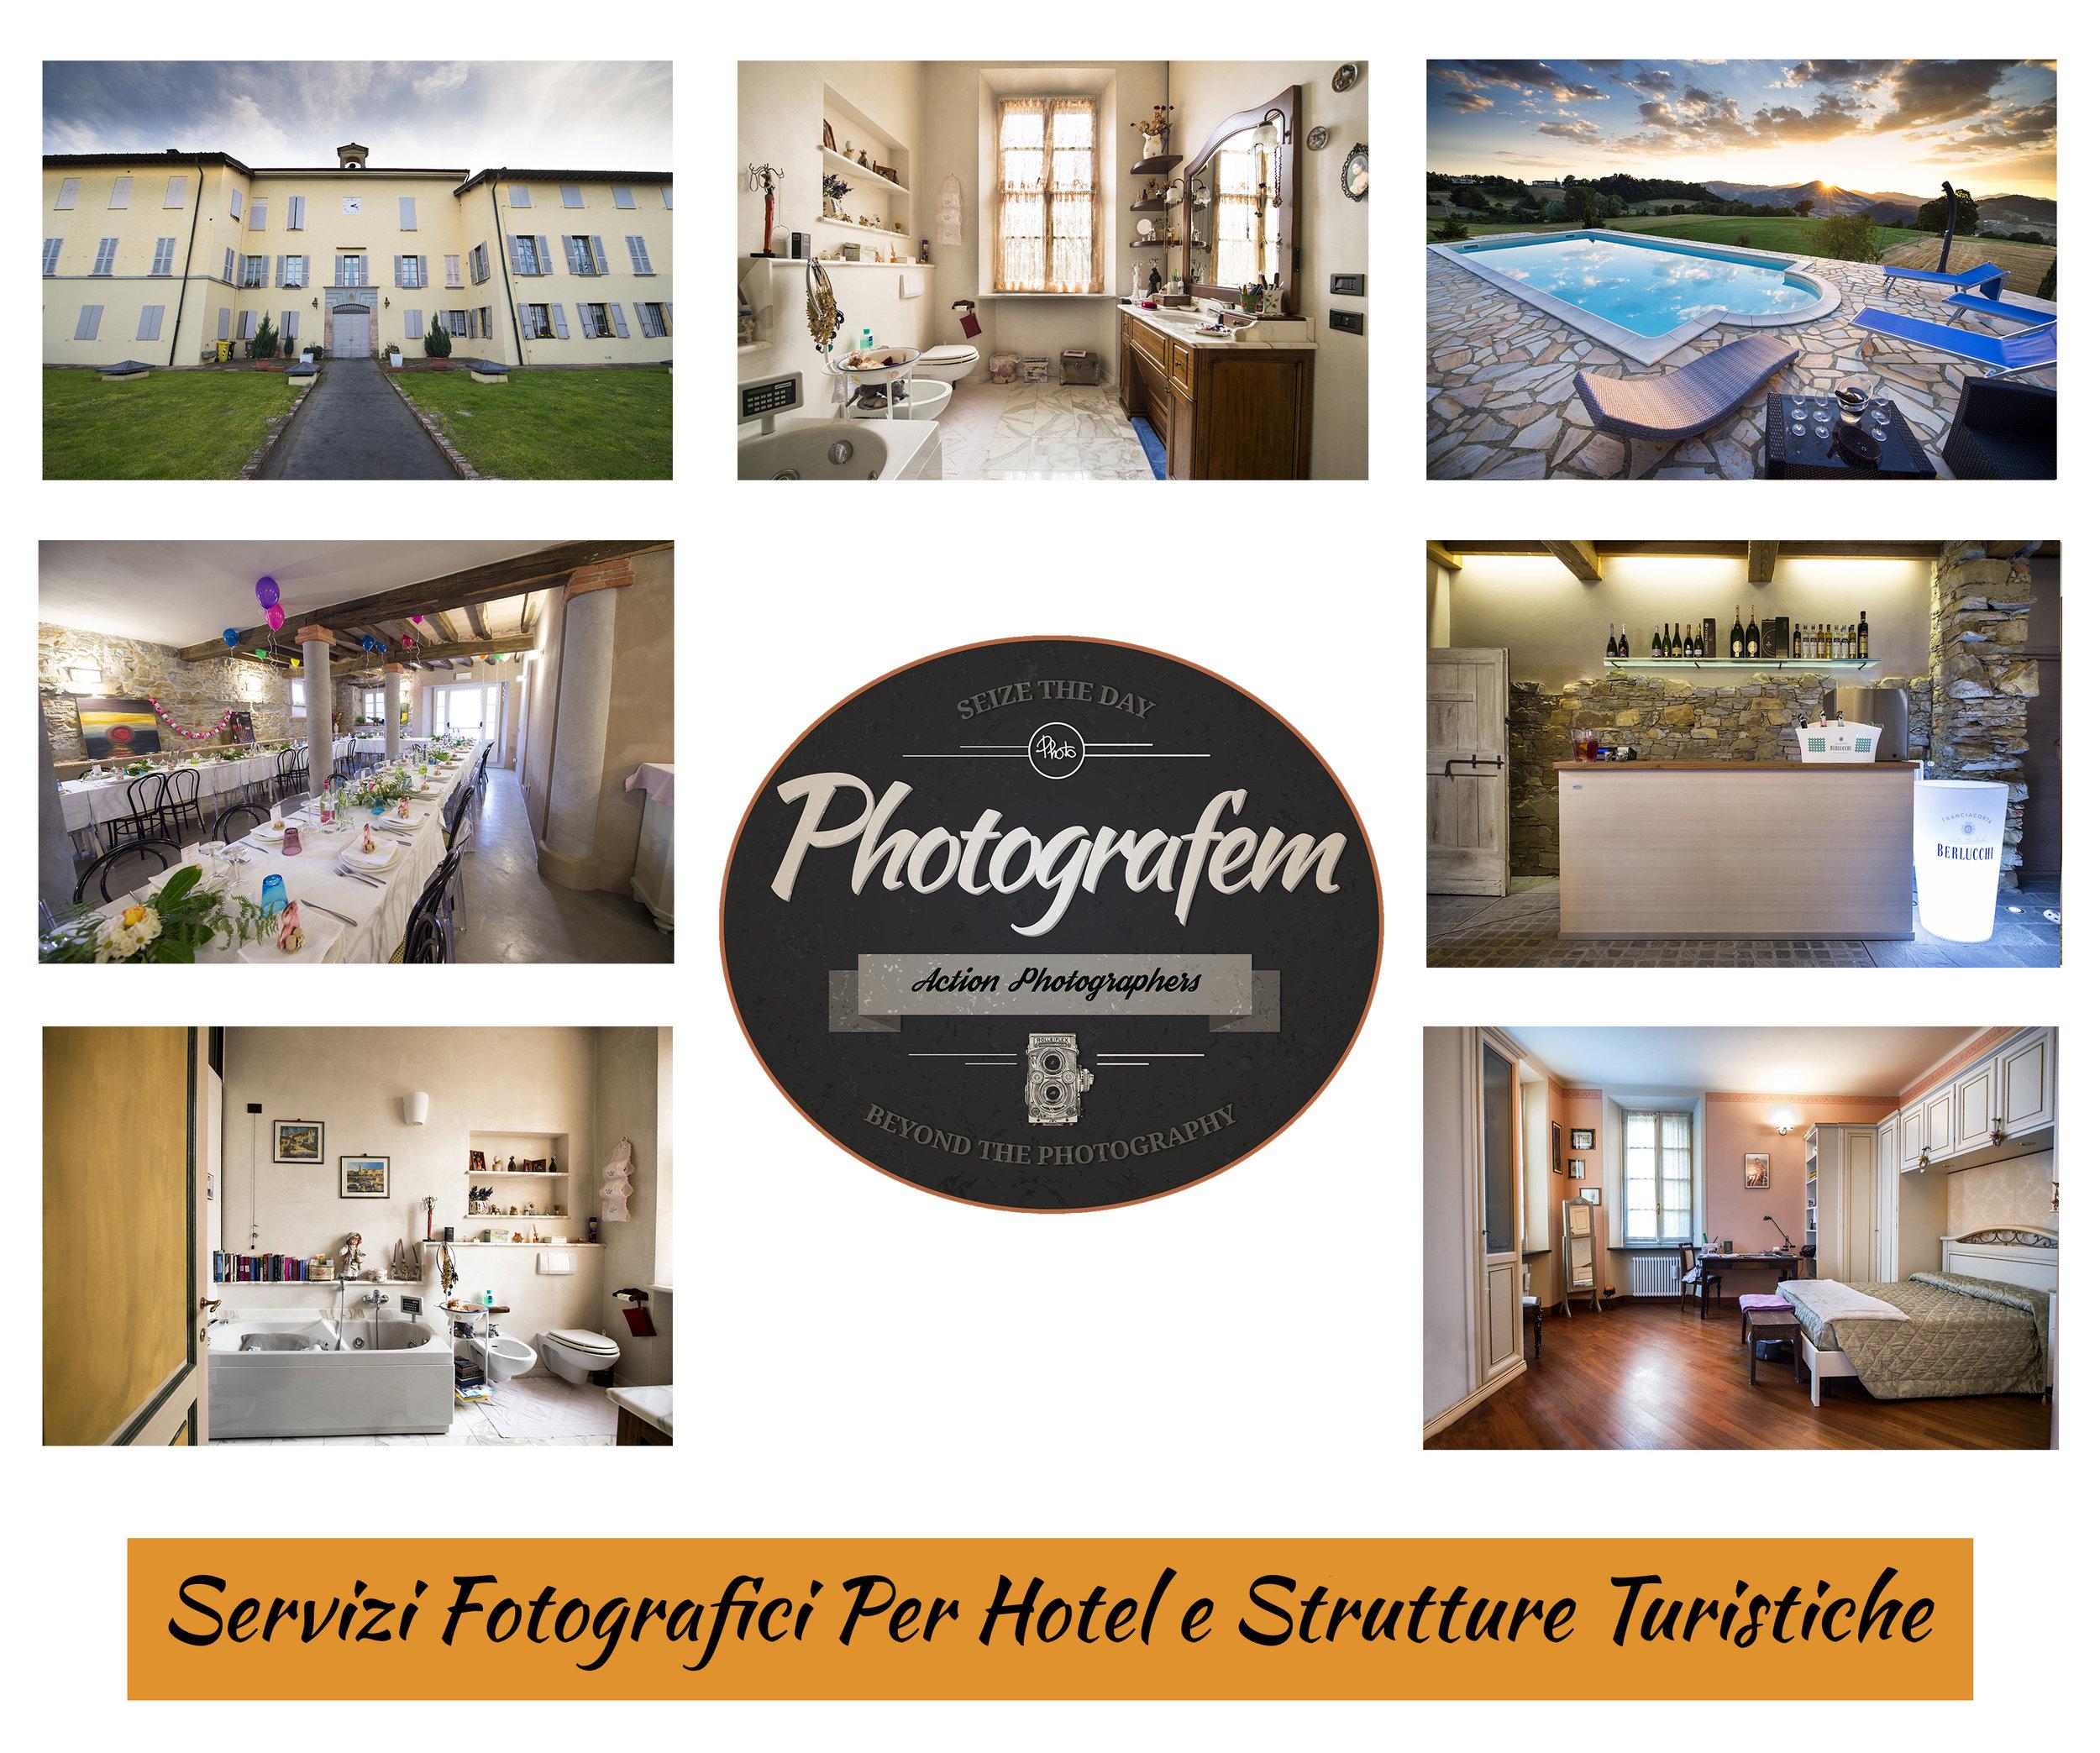 servizi-fotografici-hotel.jpg